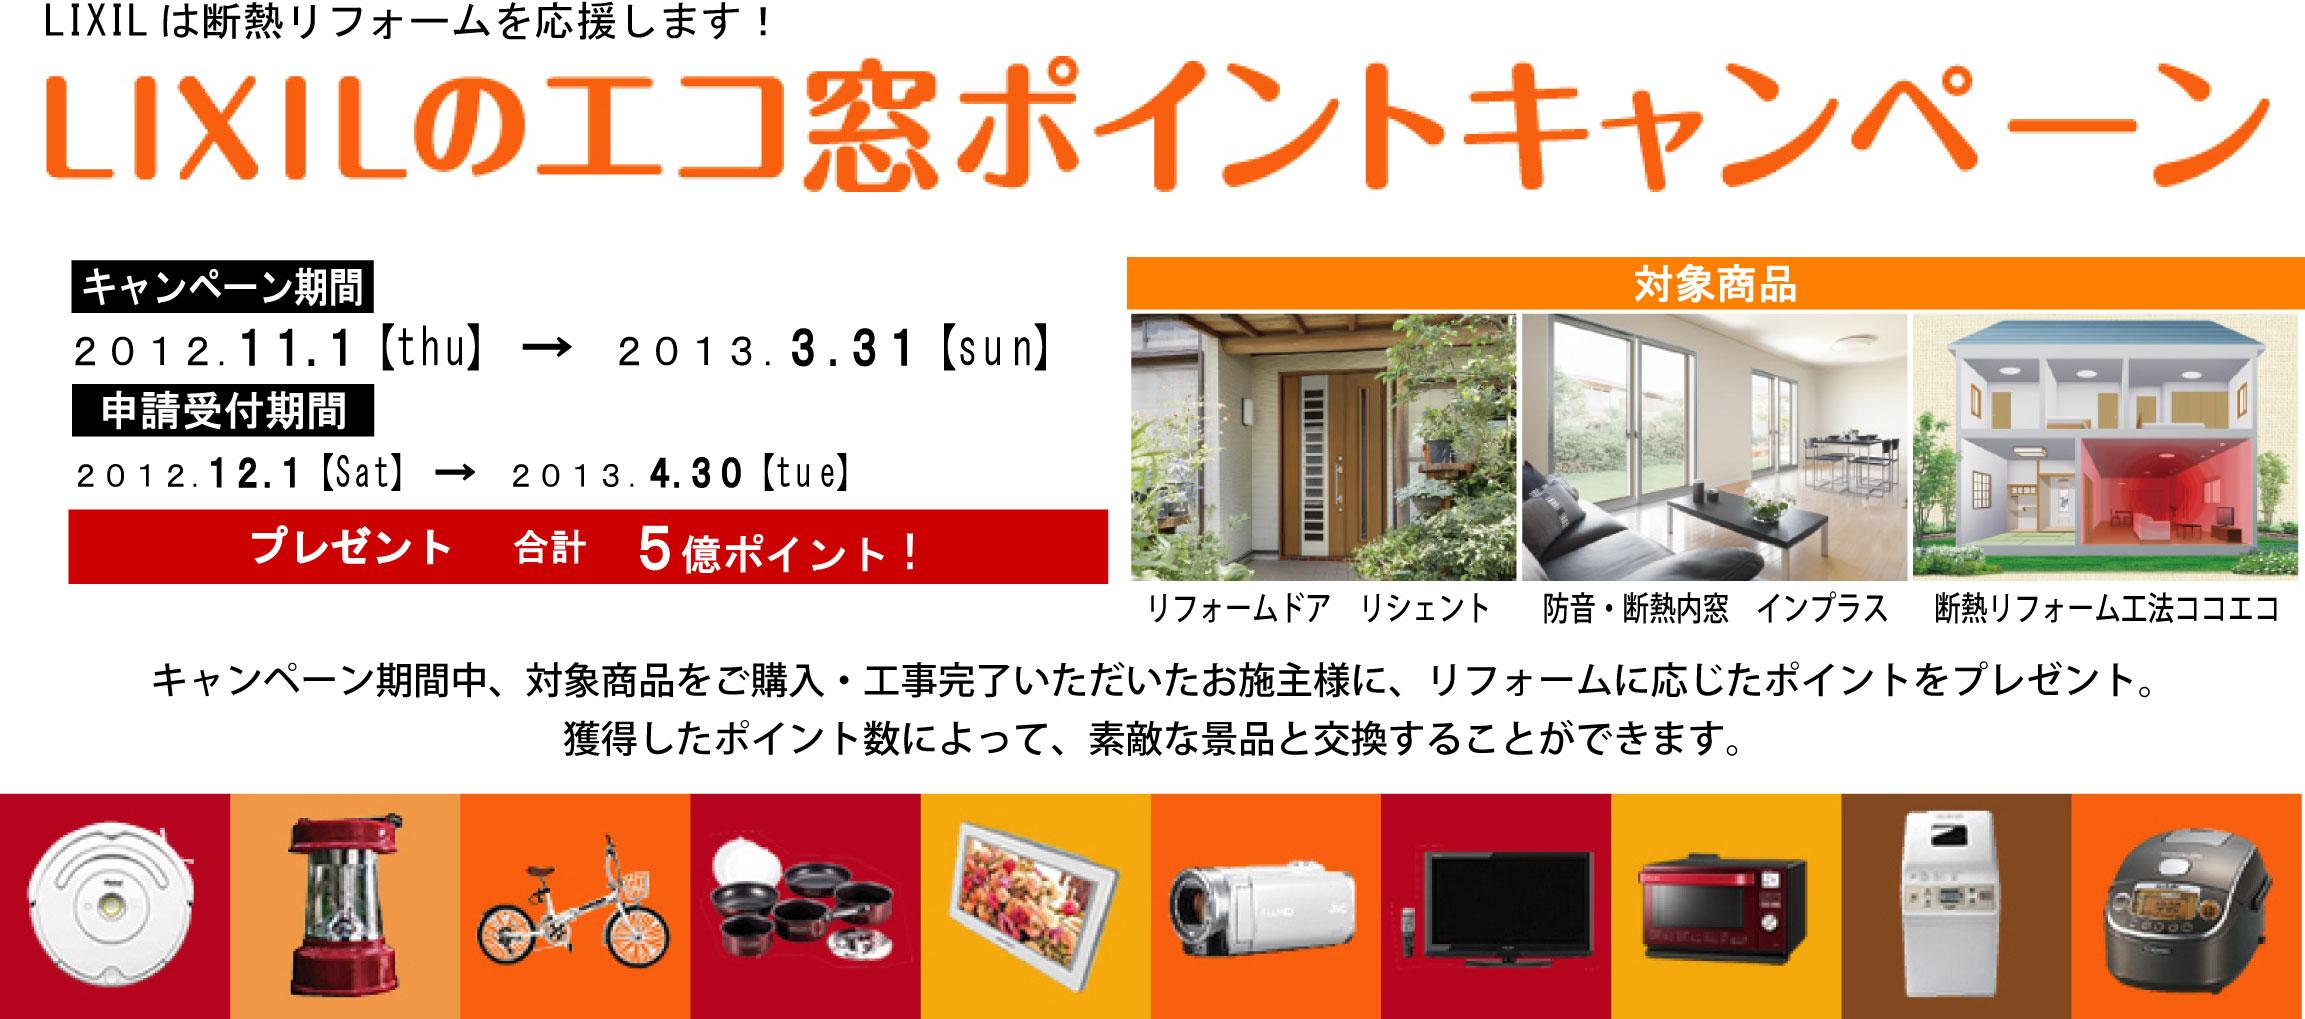 KuraSi-natu-sin67-11.jpg